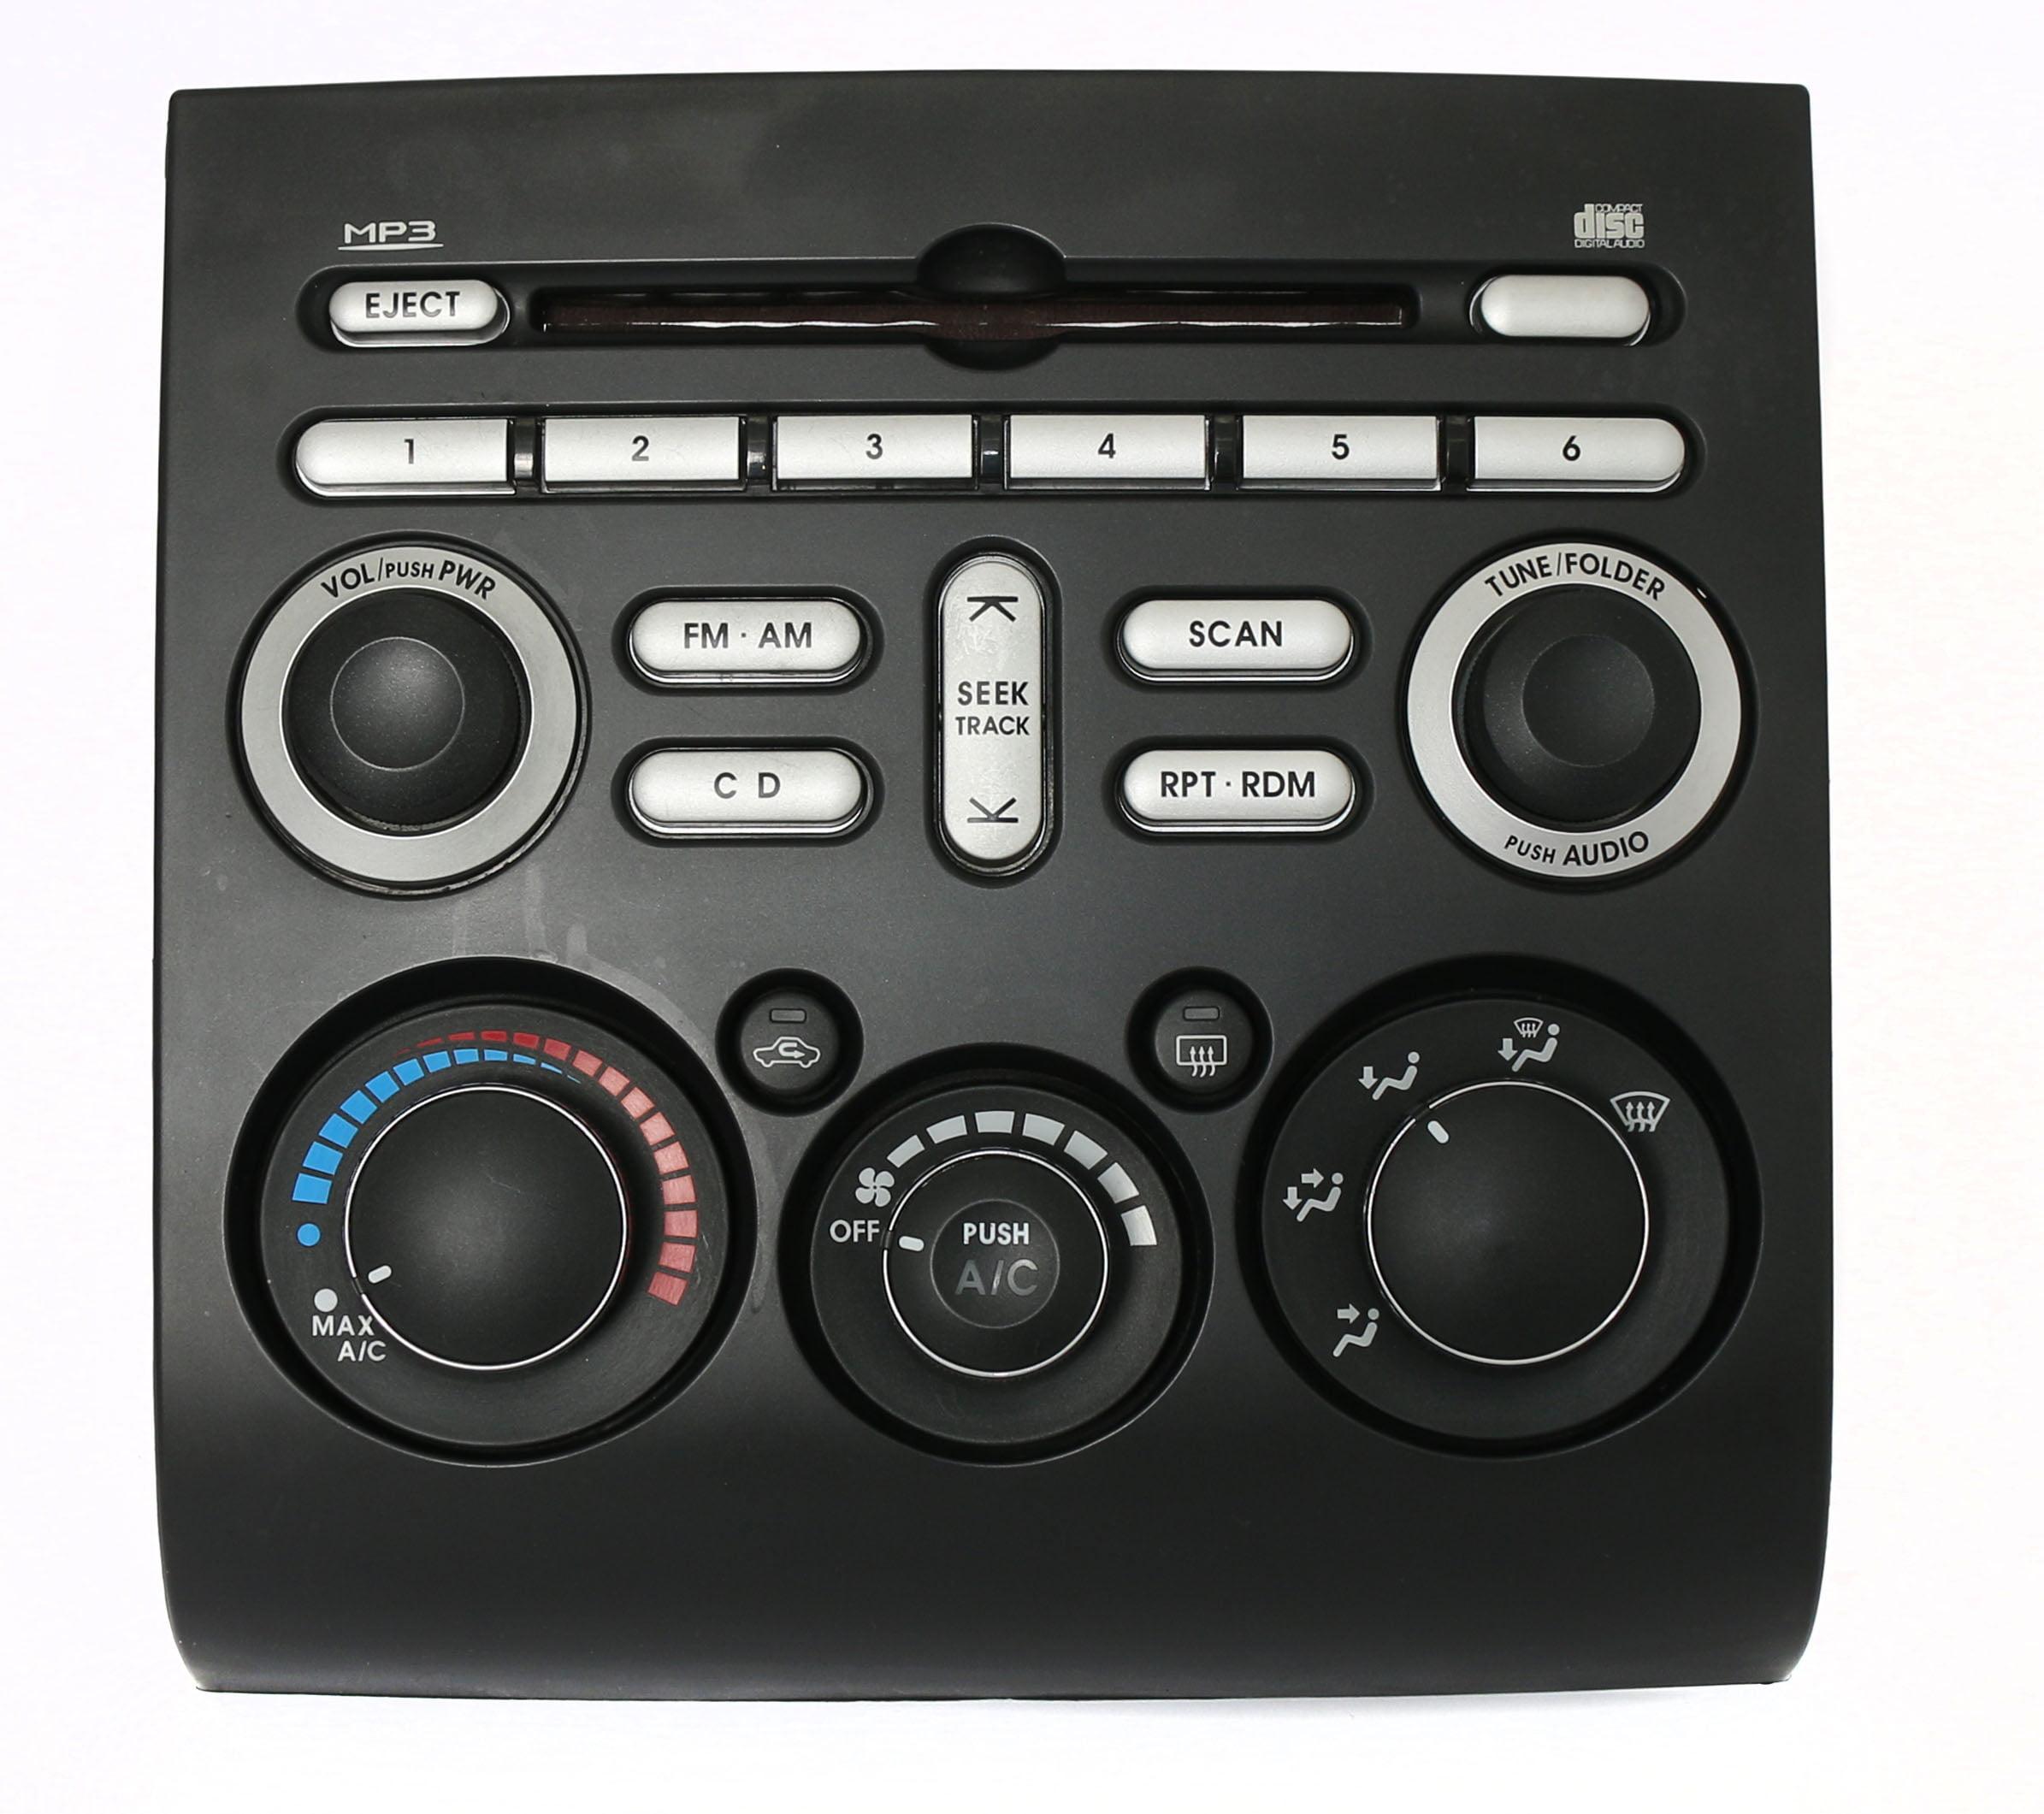 2006-2008 Mitsubishi Galant Temp Control Face Plate w CD Controls PN 8002A247HC Refurbished by Mitsubishi